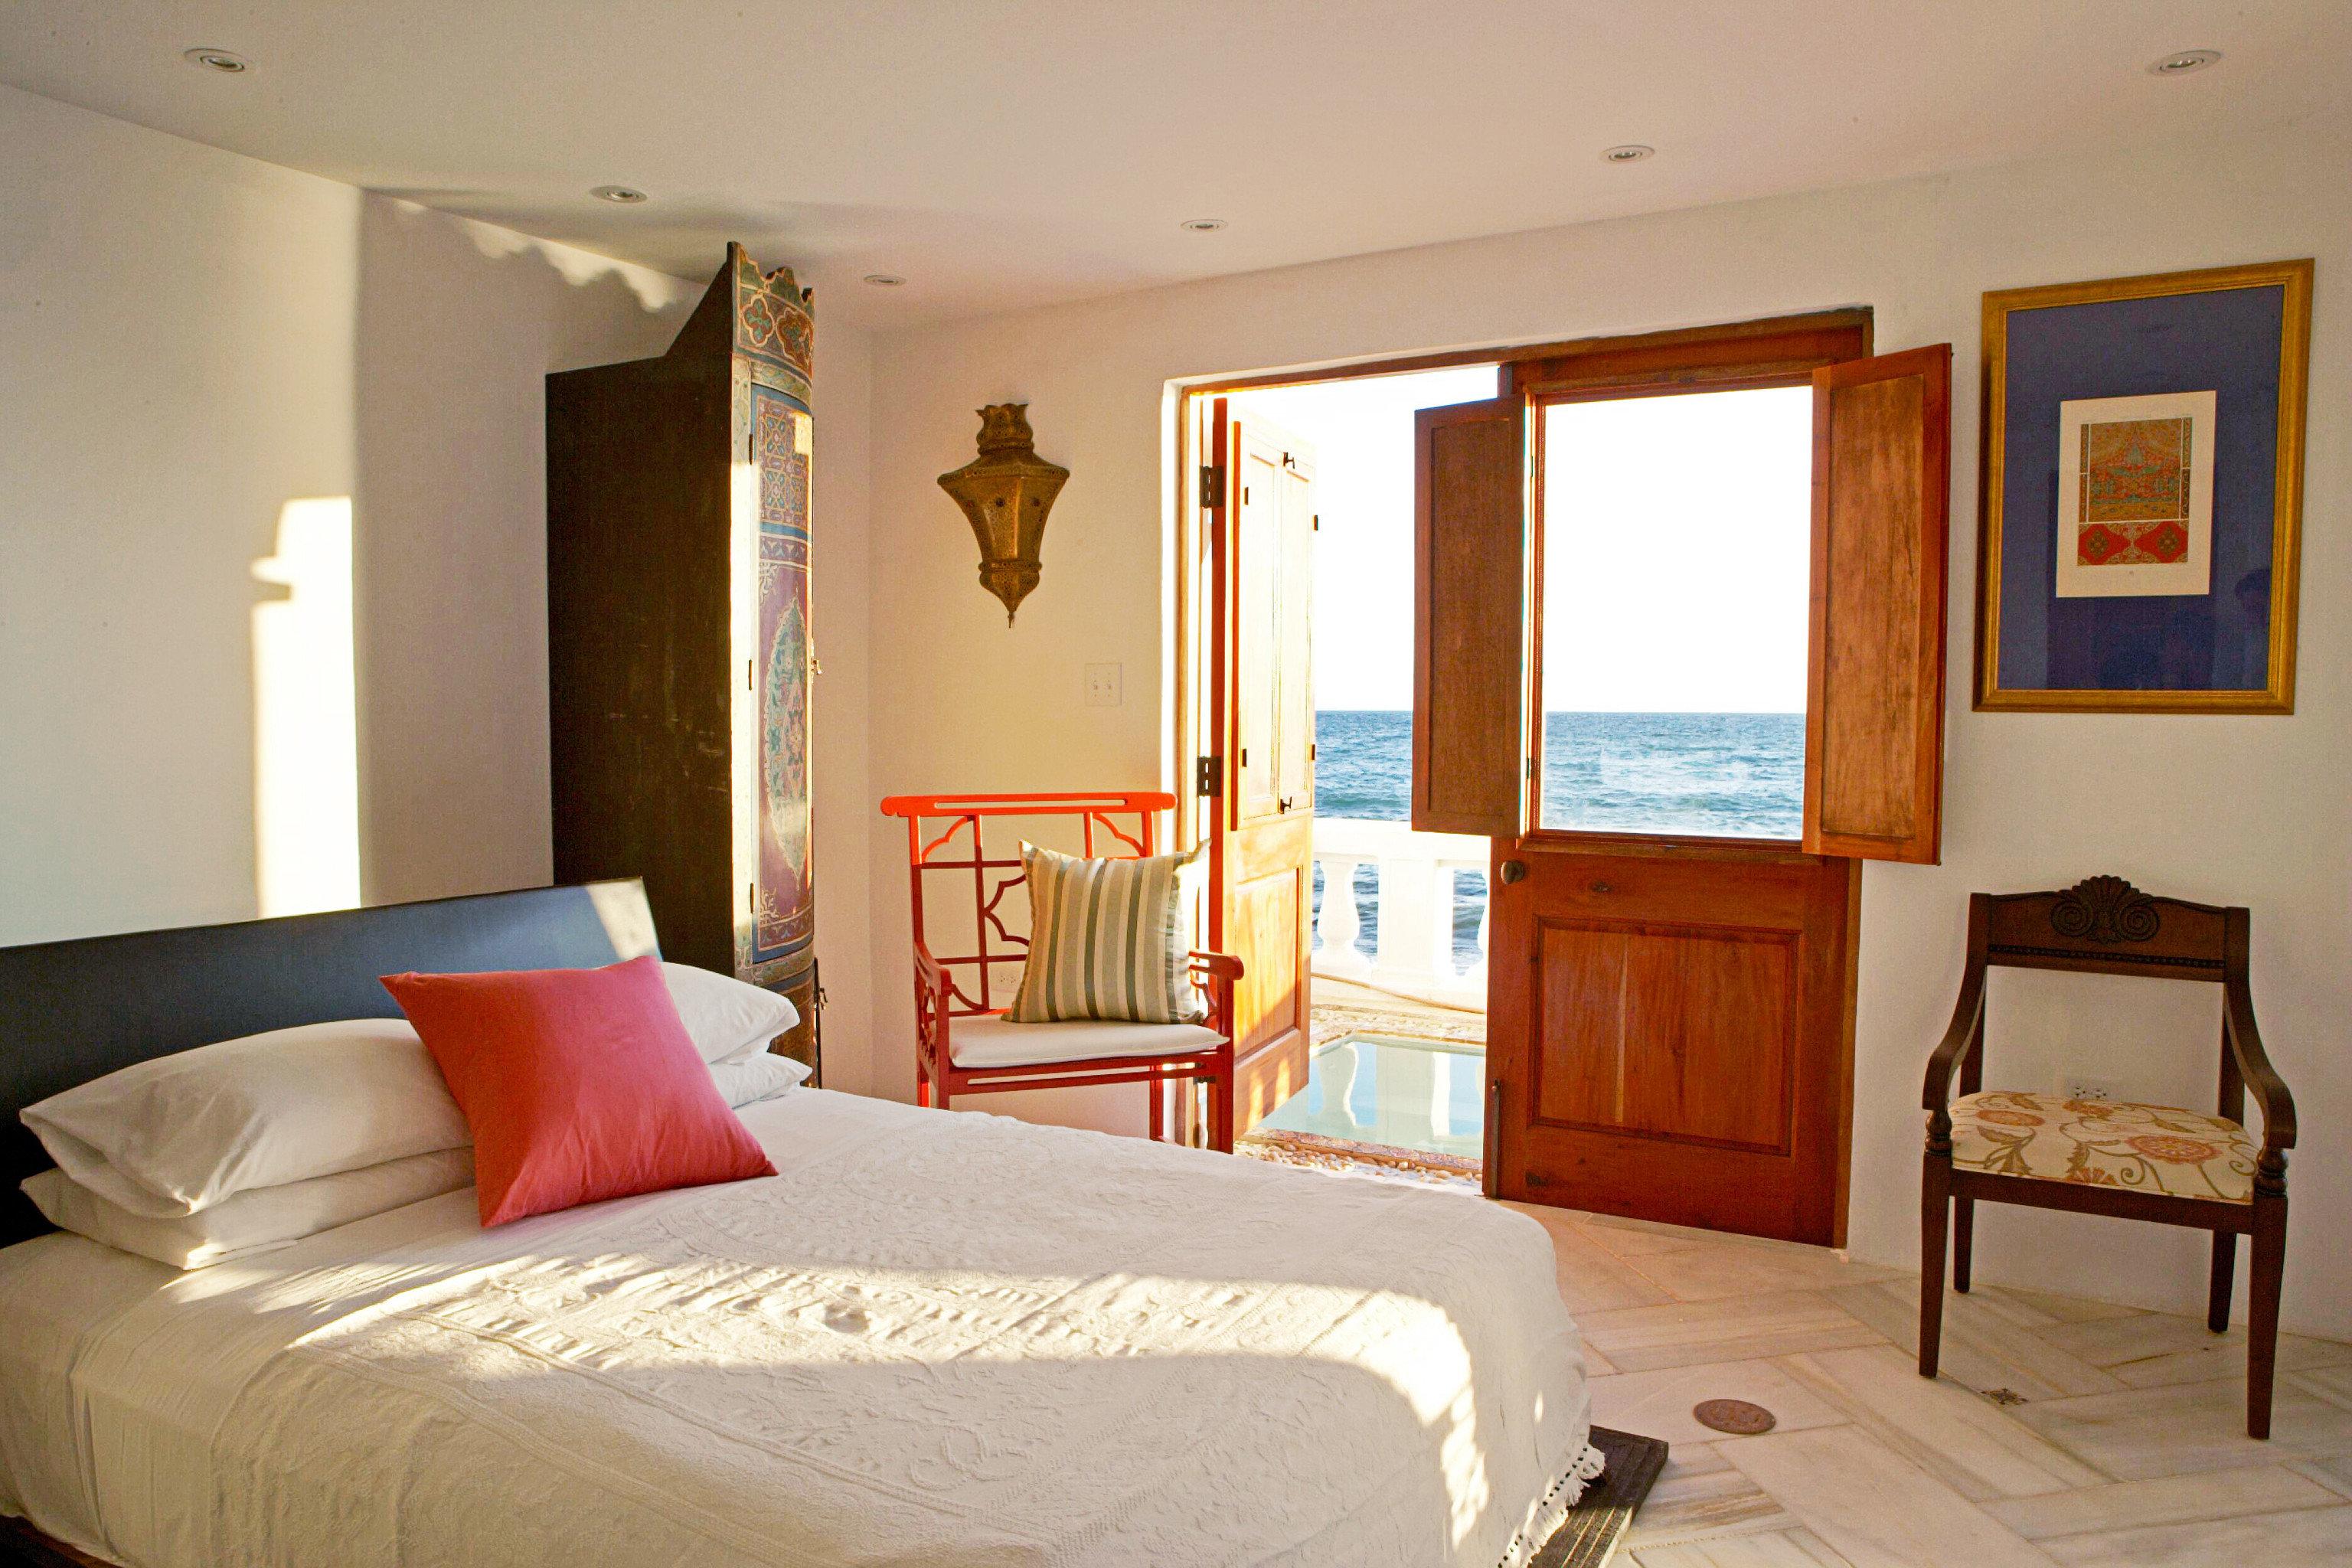 Balcony Bedroom Luxury Resort Scenic views property scene cottage Suite home Villa